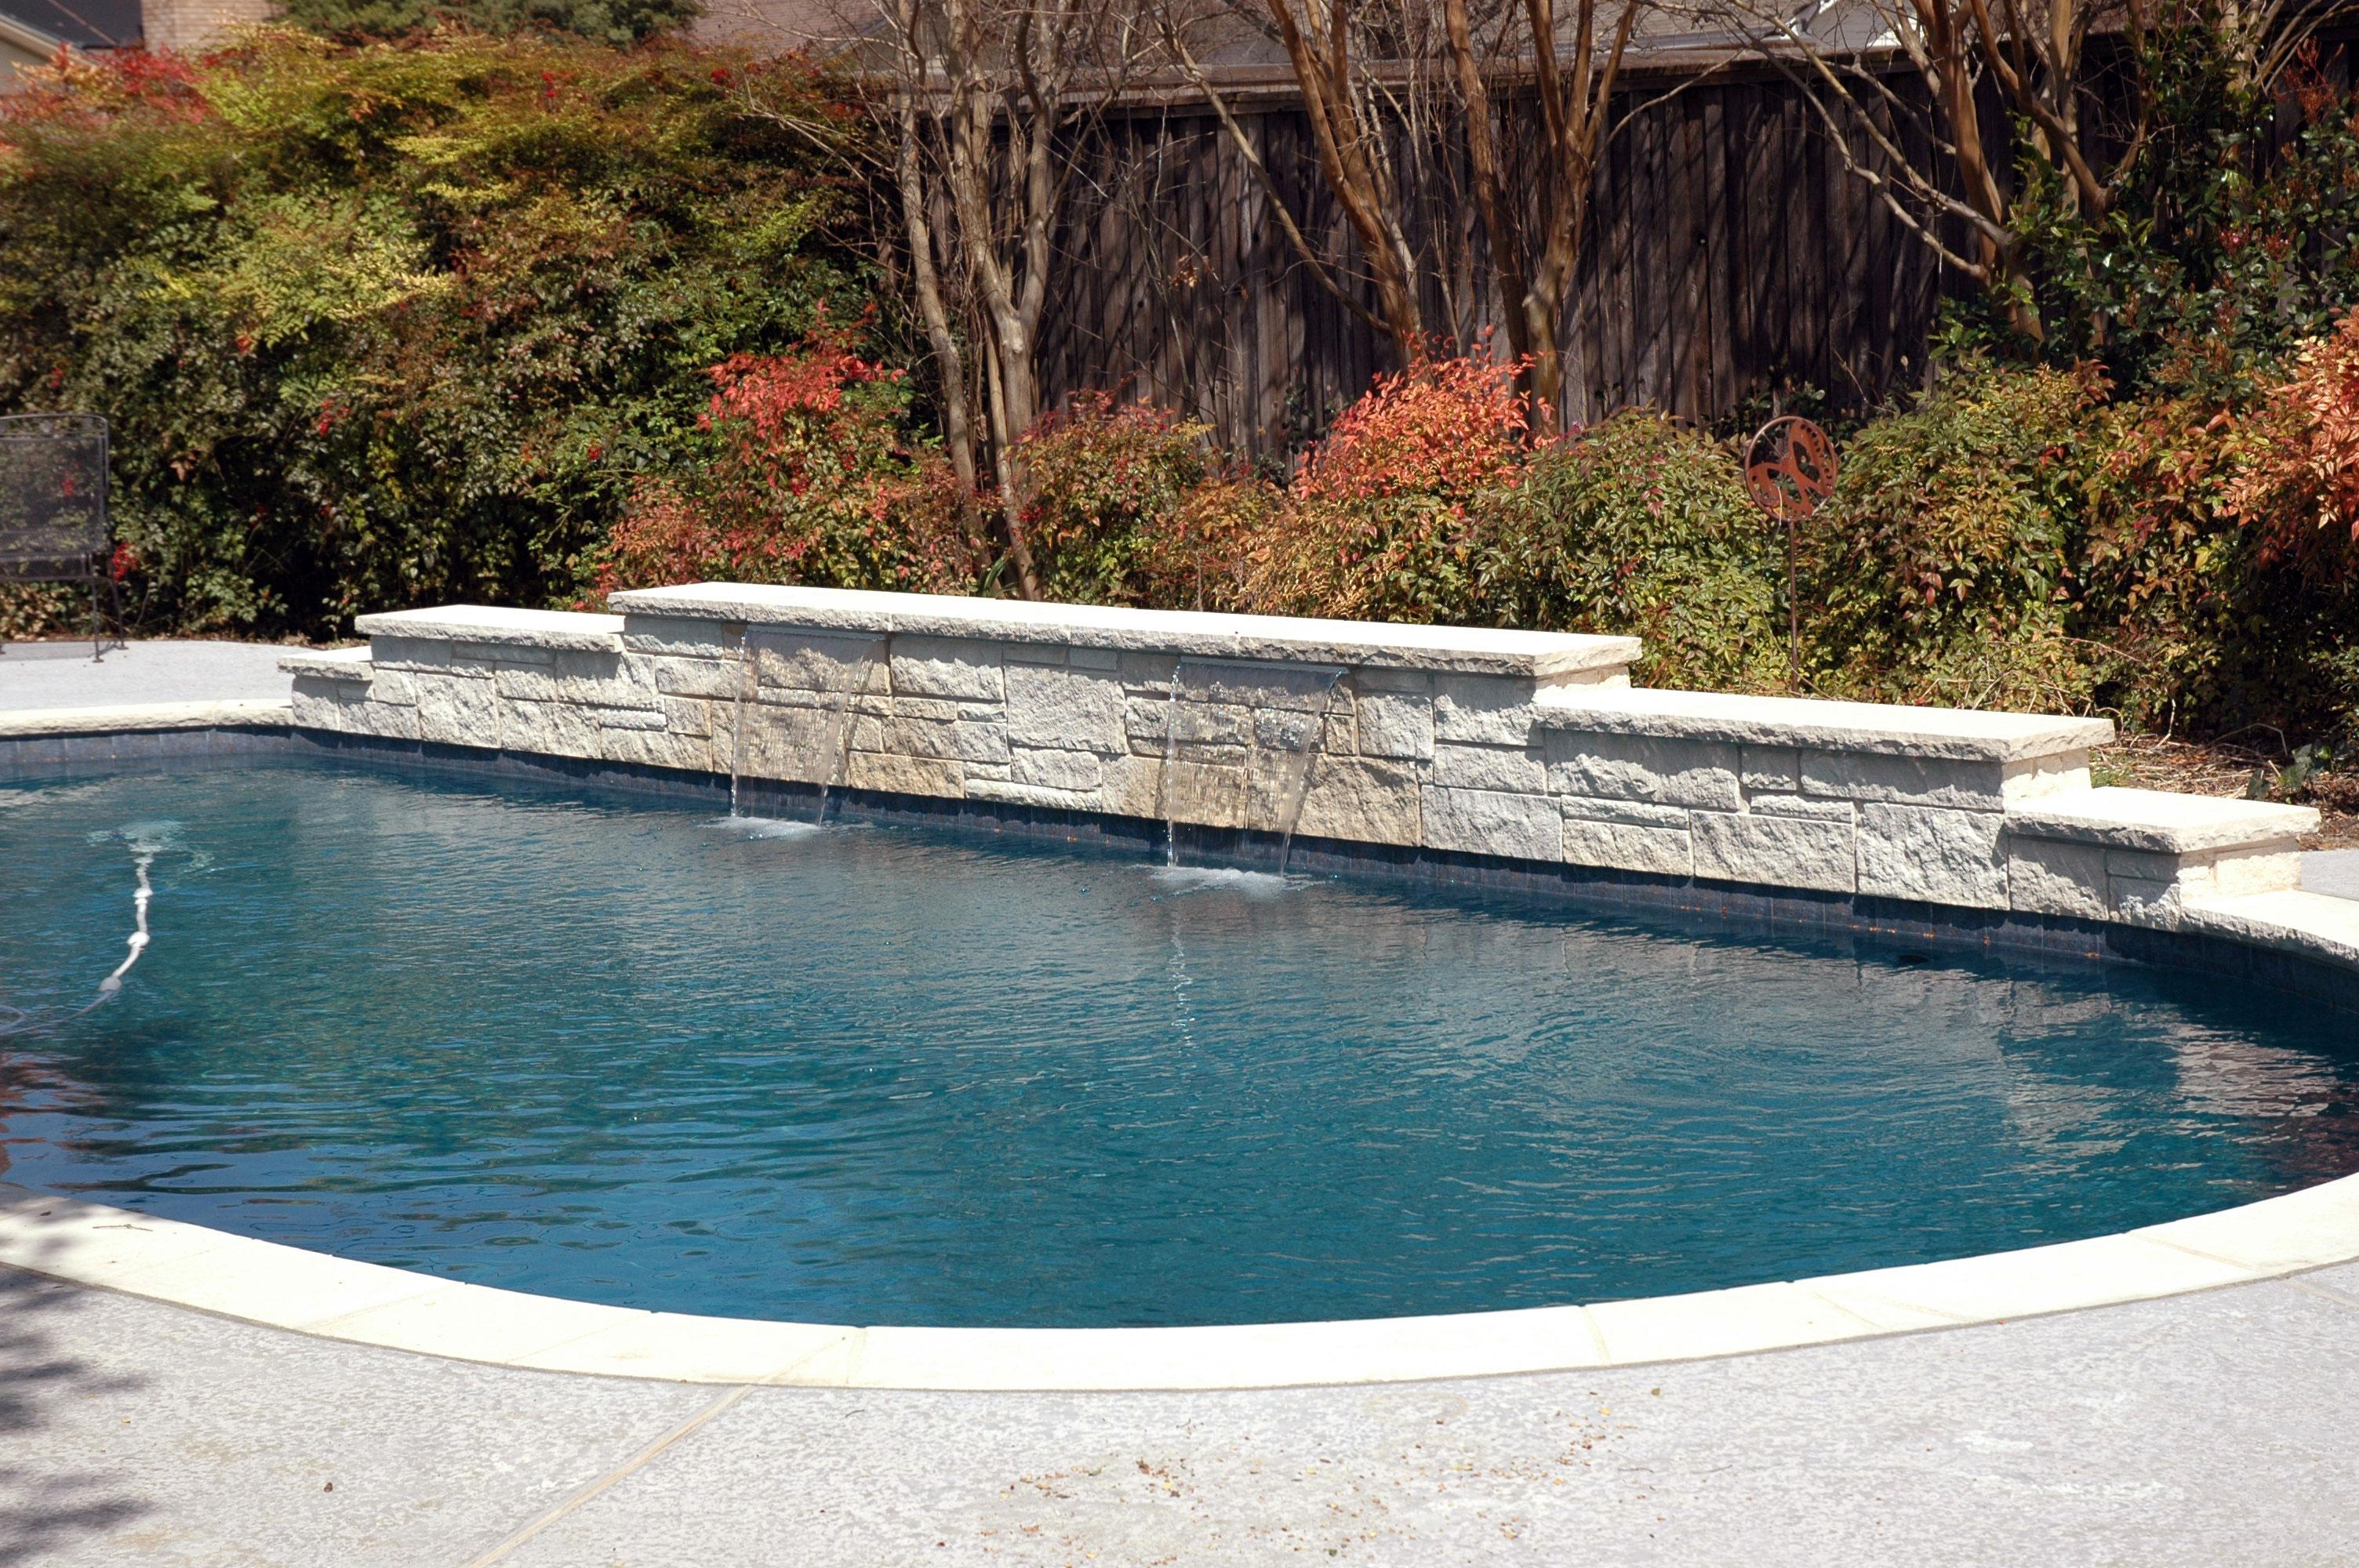 Pool 97